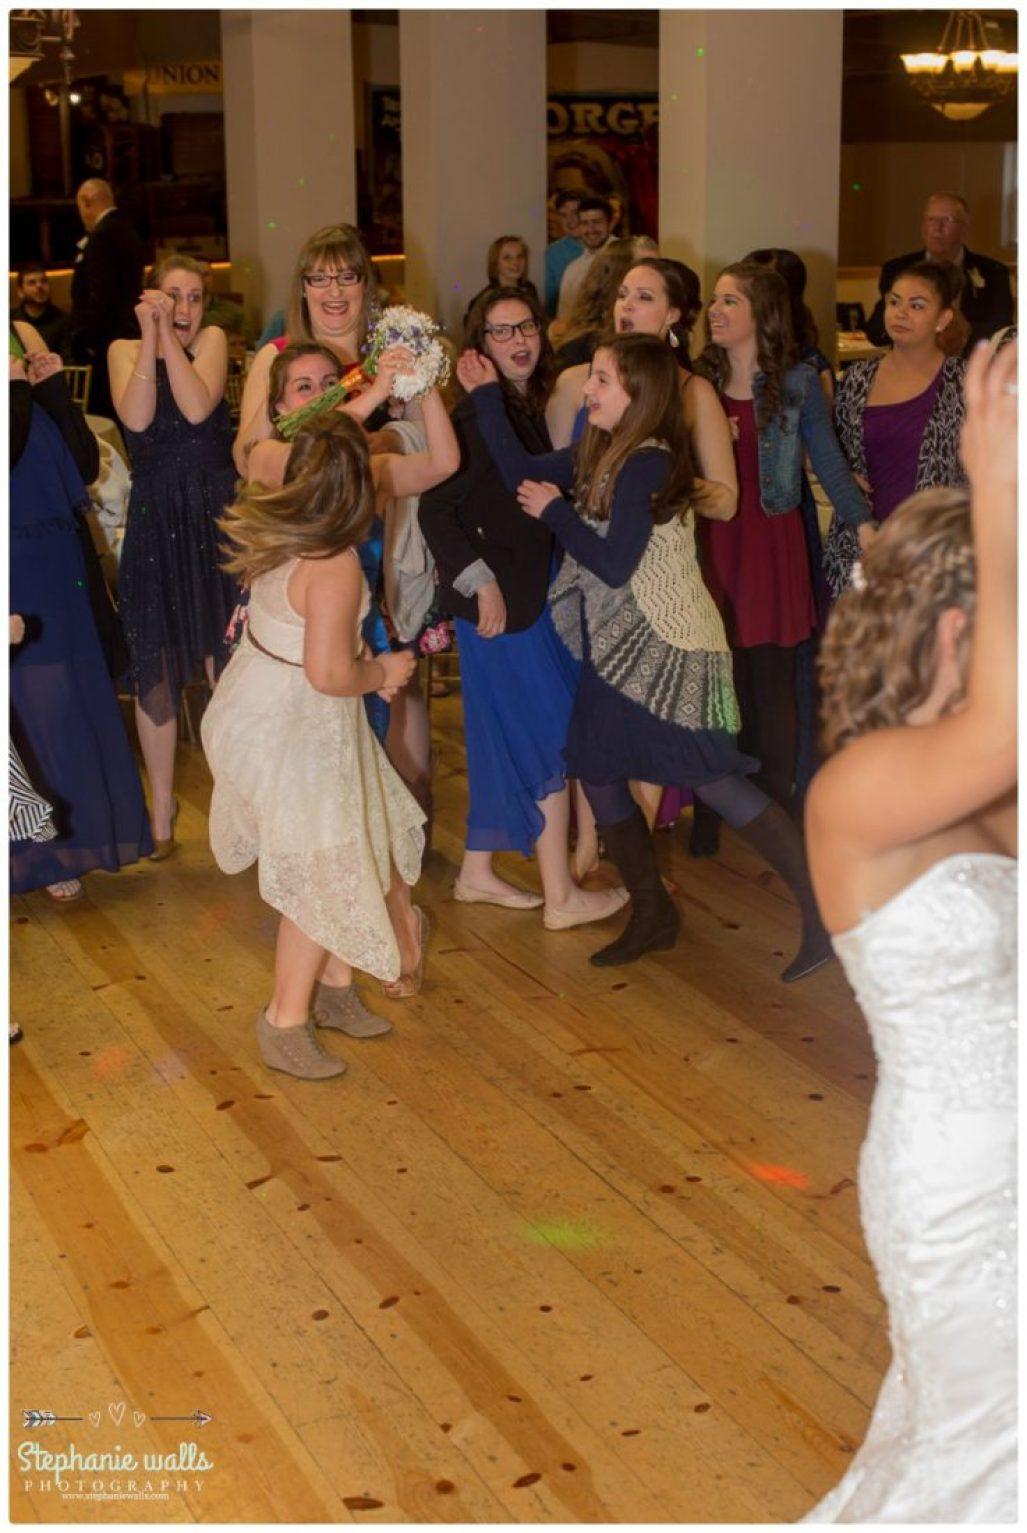 2016 03 24 0097 Racing Love   Snohomish Event Center   Snohomish Wedding Photographer